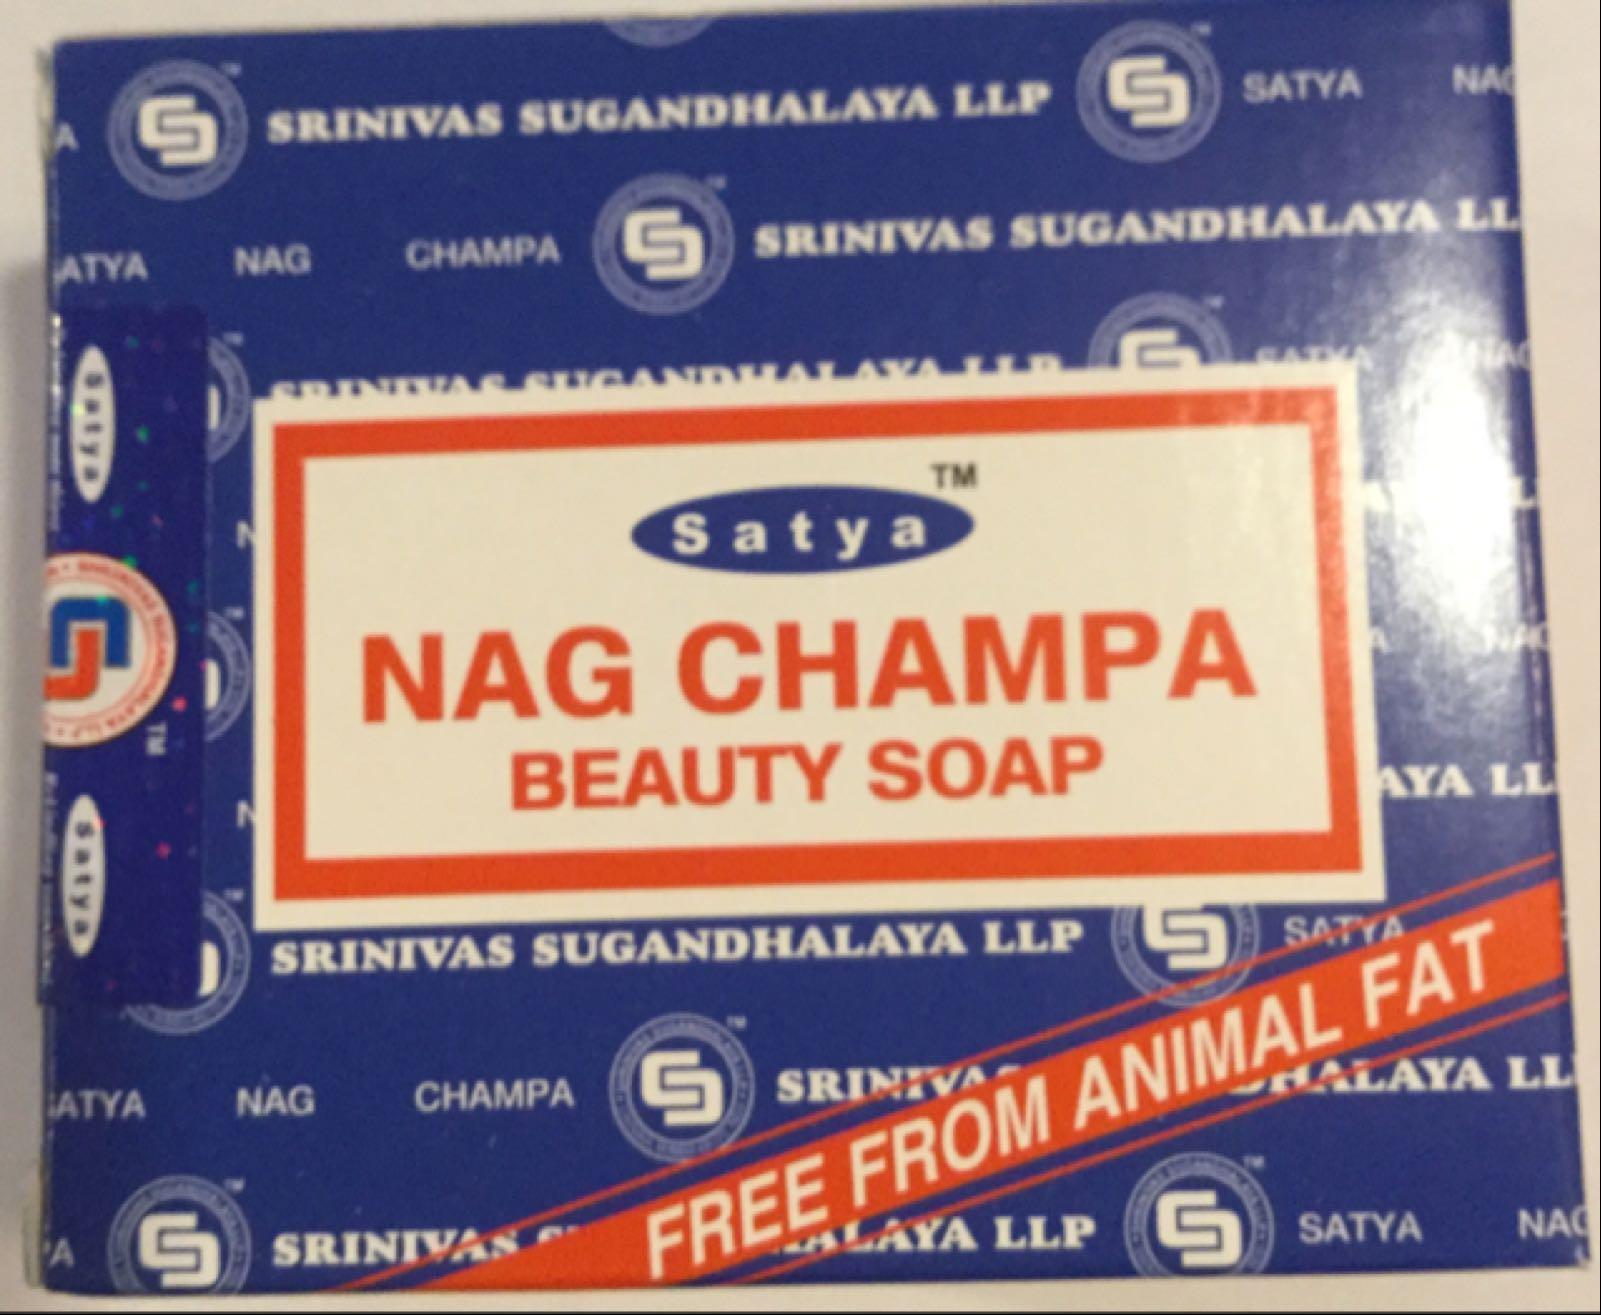 Nag Champa tvål 75g 69:-